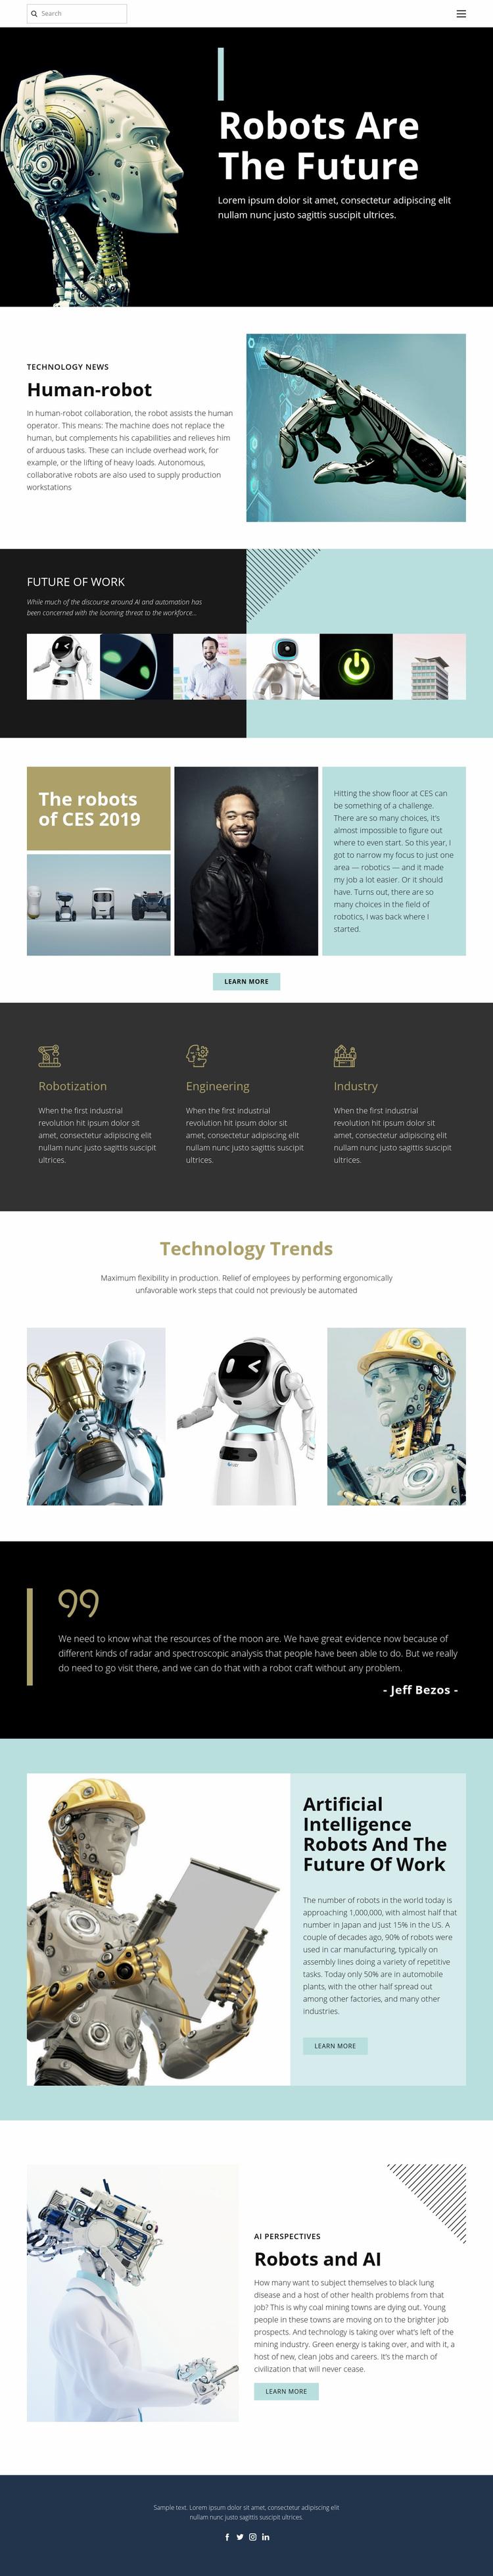 Already future technology Web Page Designer